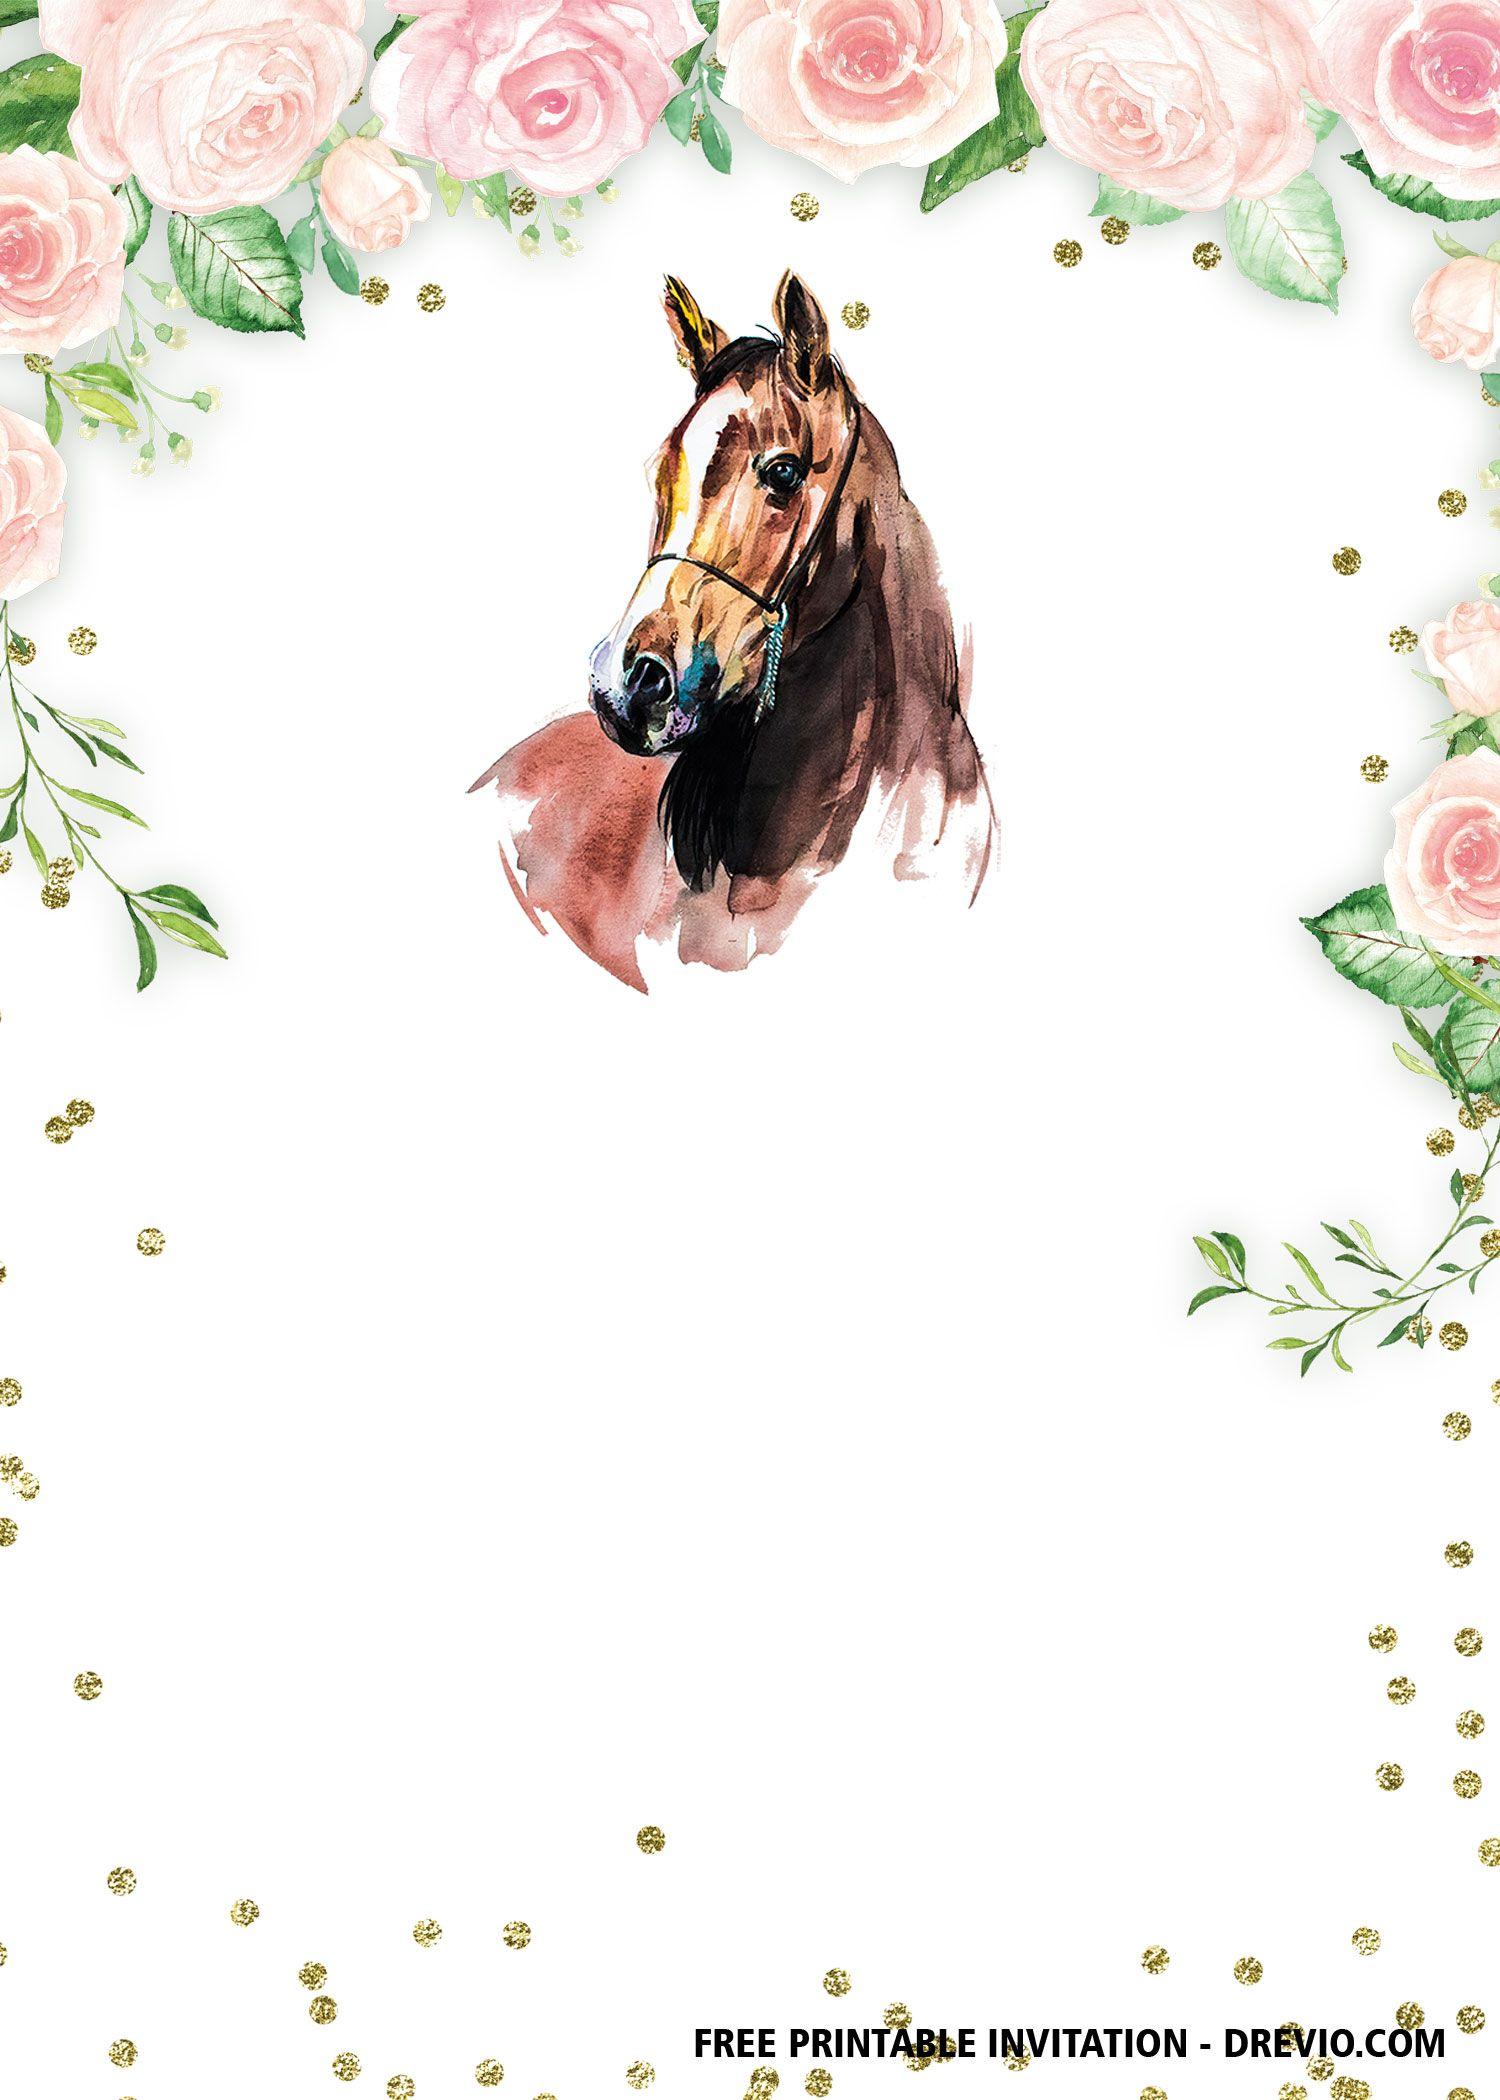 FREE Printable Horse Floral Vintage Invitation Templates  DREVIO